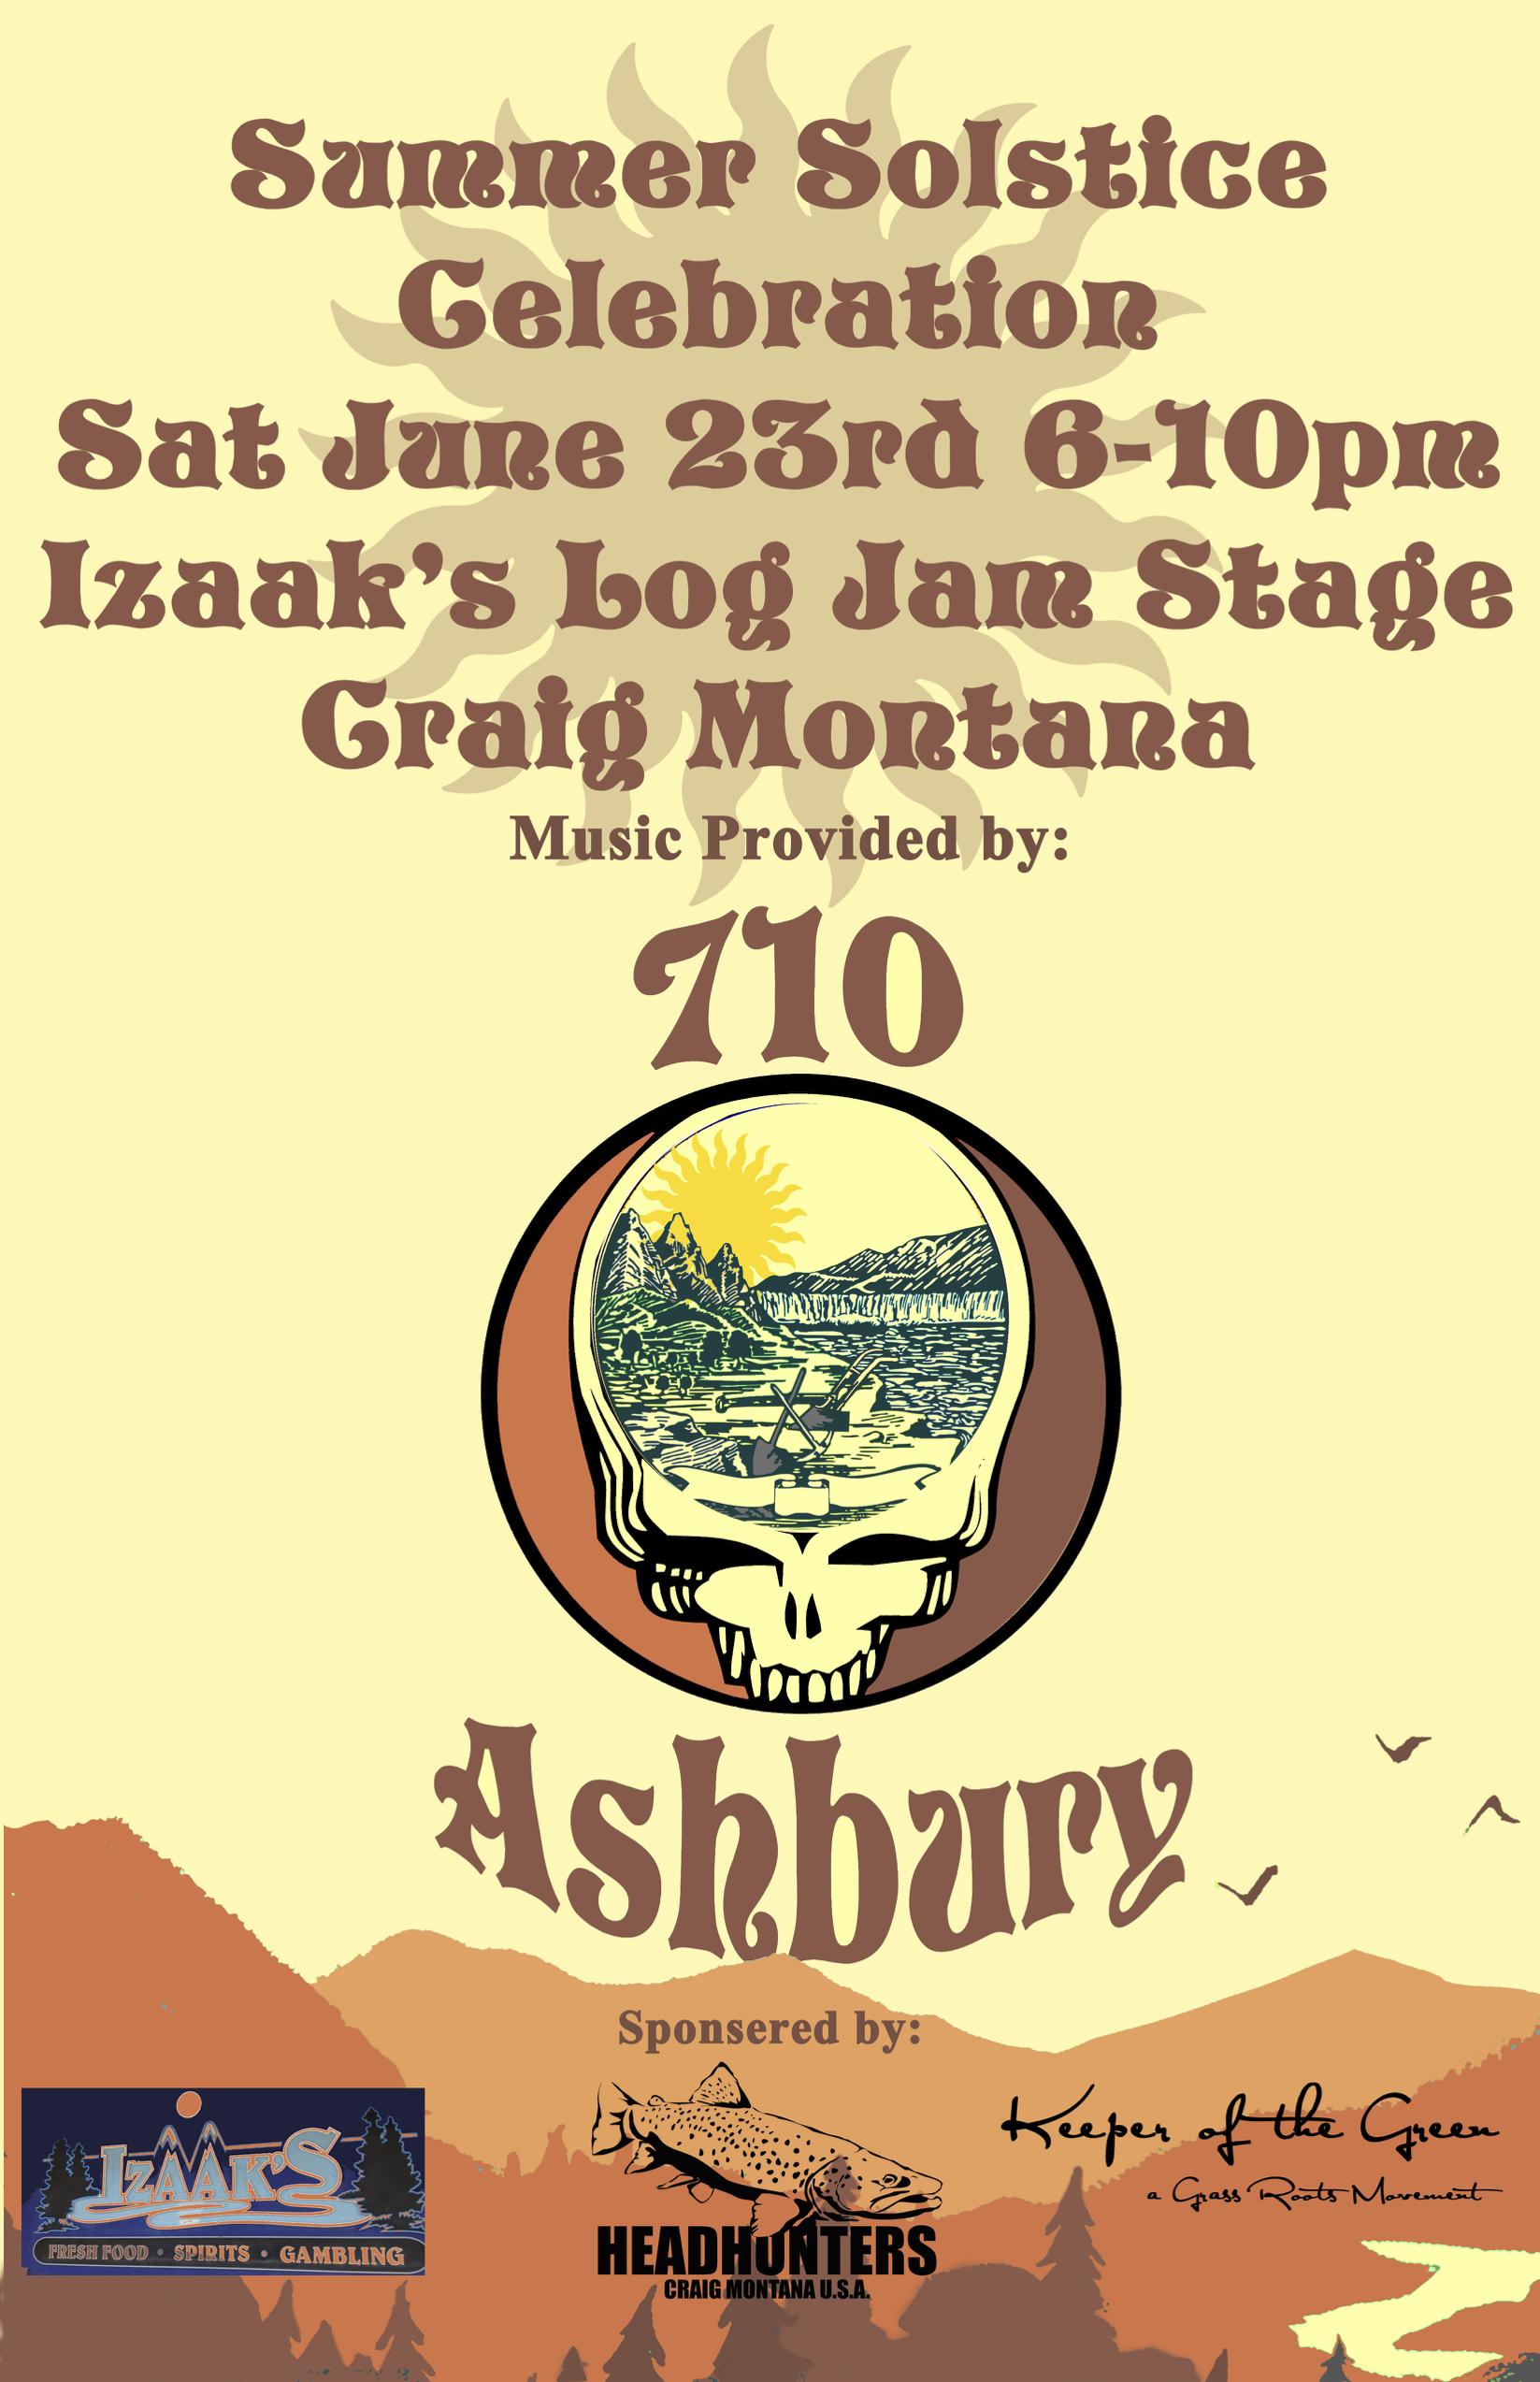 710 Ashbury Tonight in Craig MT